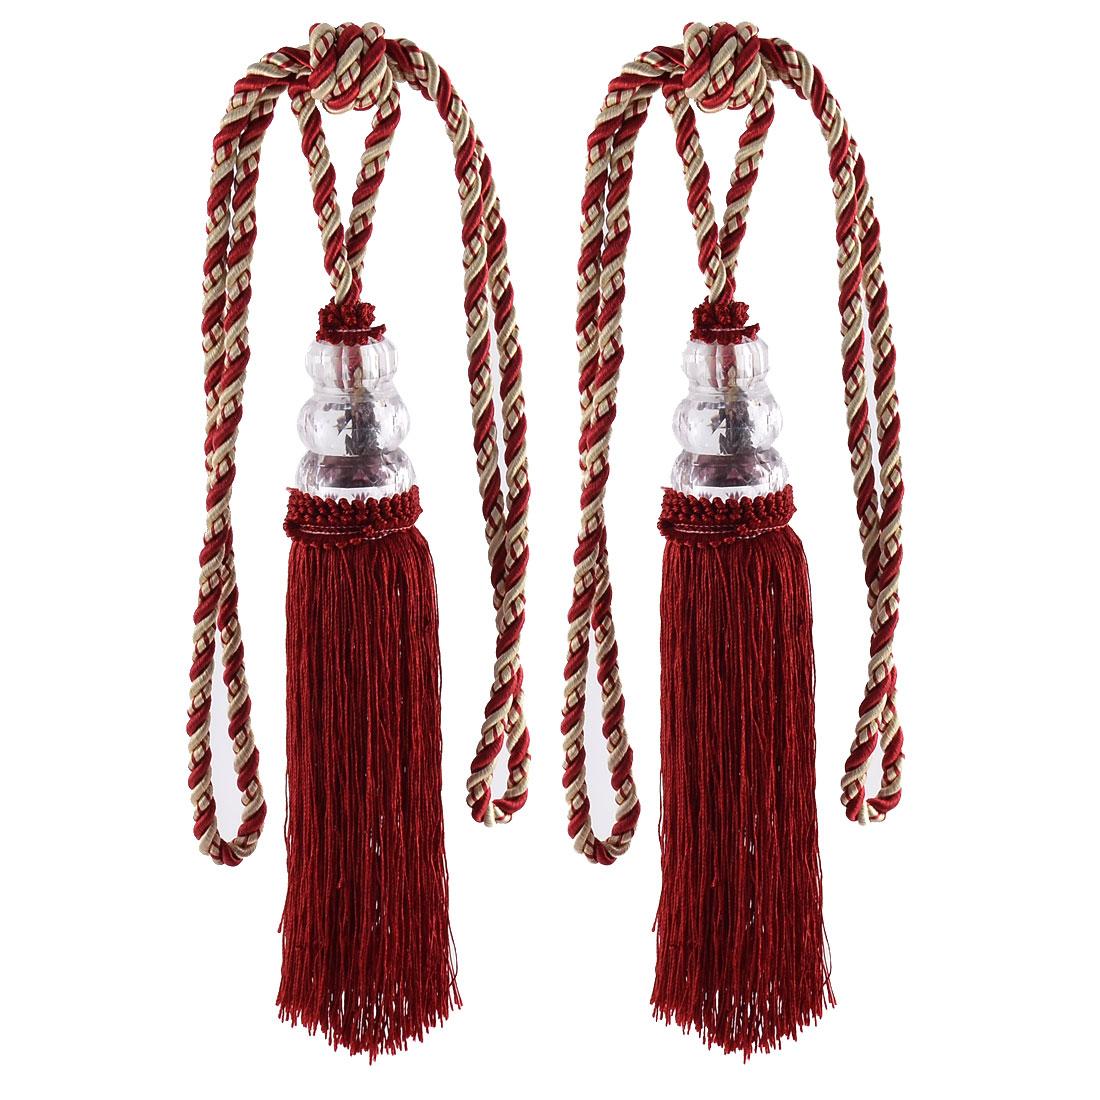 Home Plastic Bead Drapery Curtain Decoration Tassel Fringe Detail Tieback Rope Cord Dark Red Pair